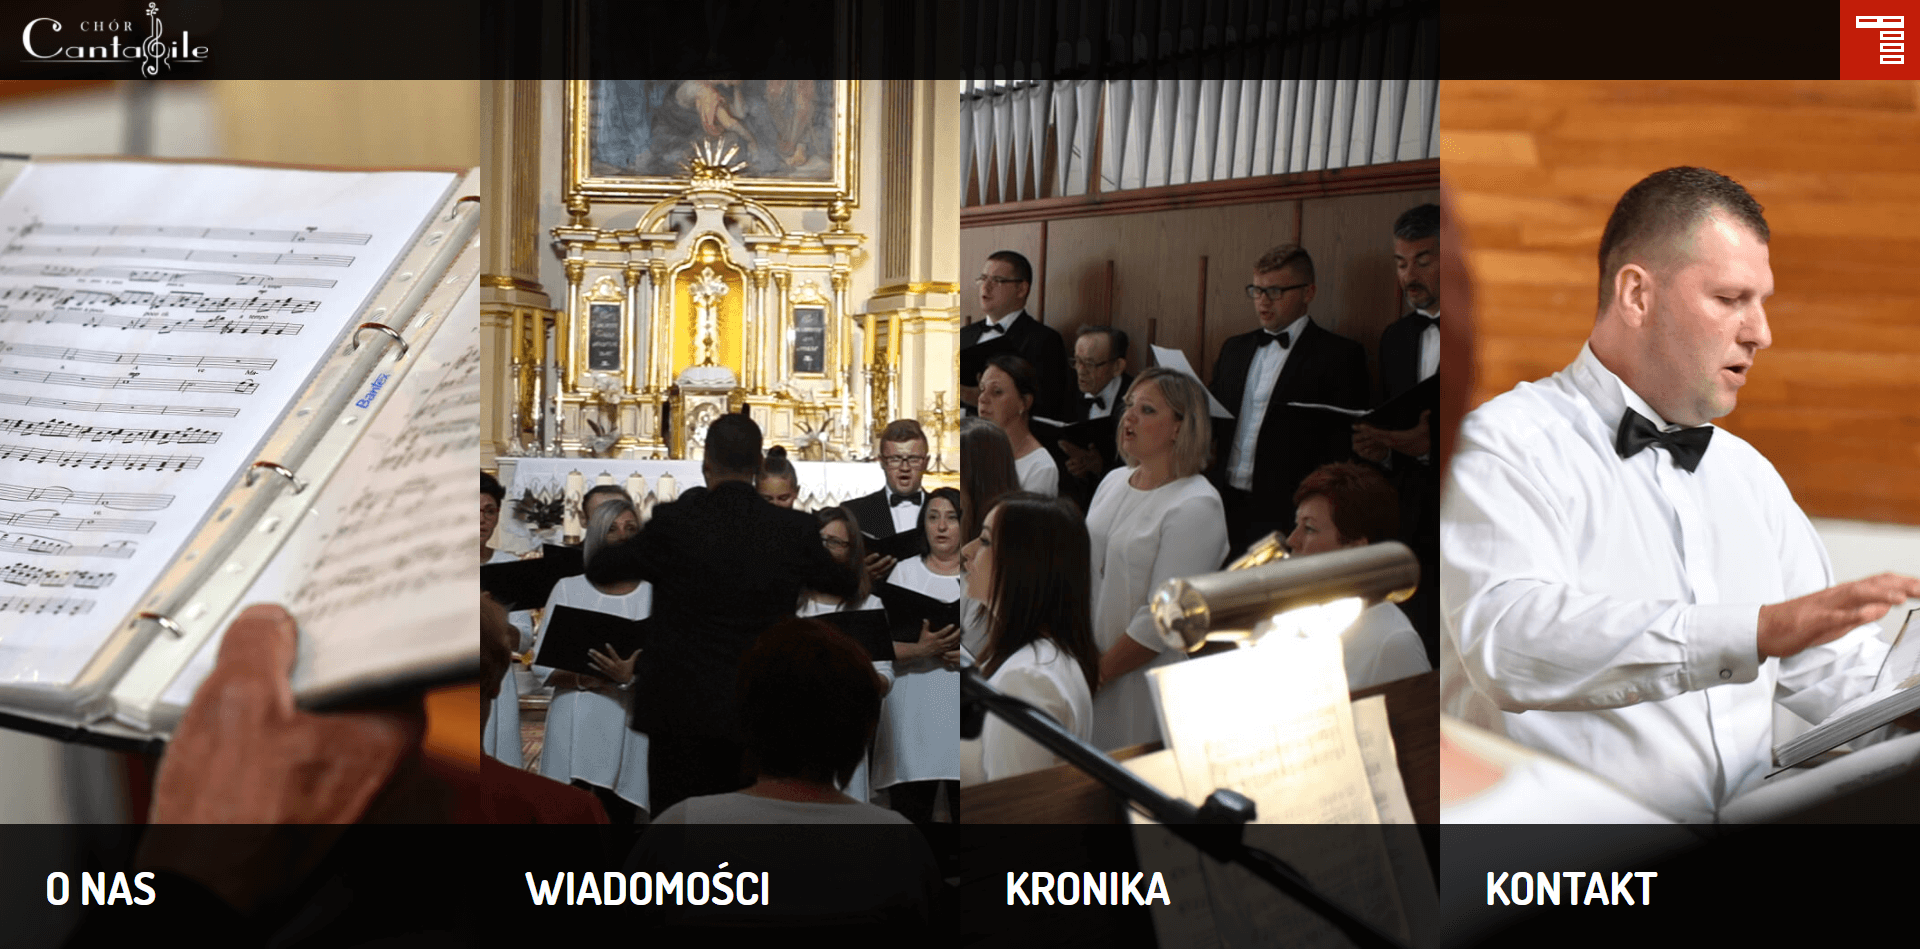 cantabile-luzna.pl